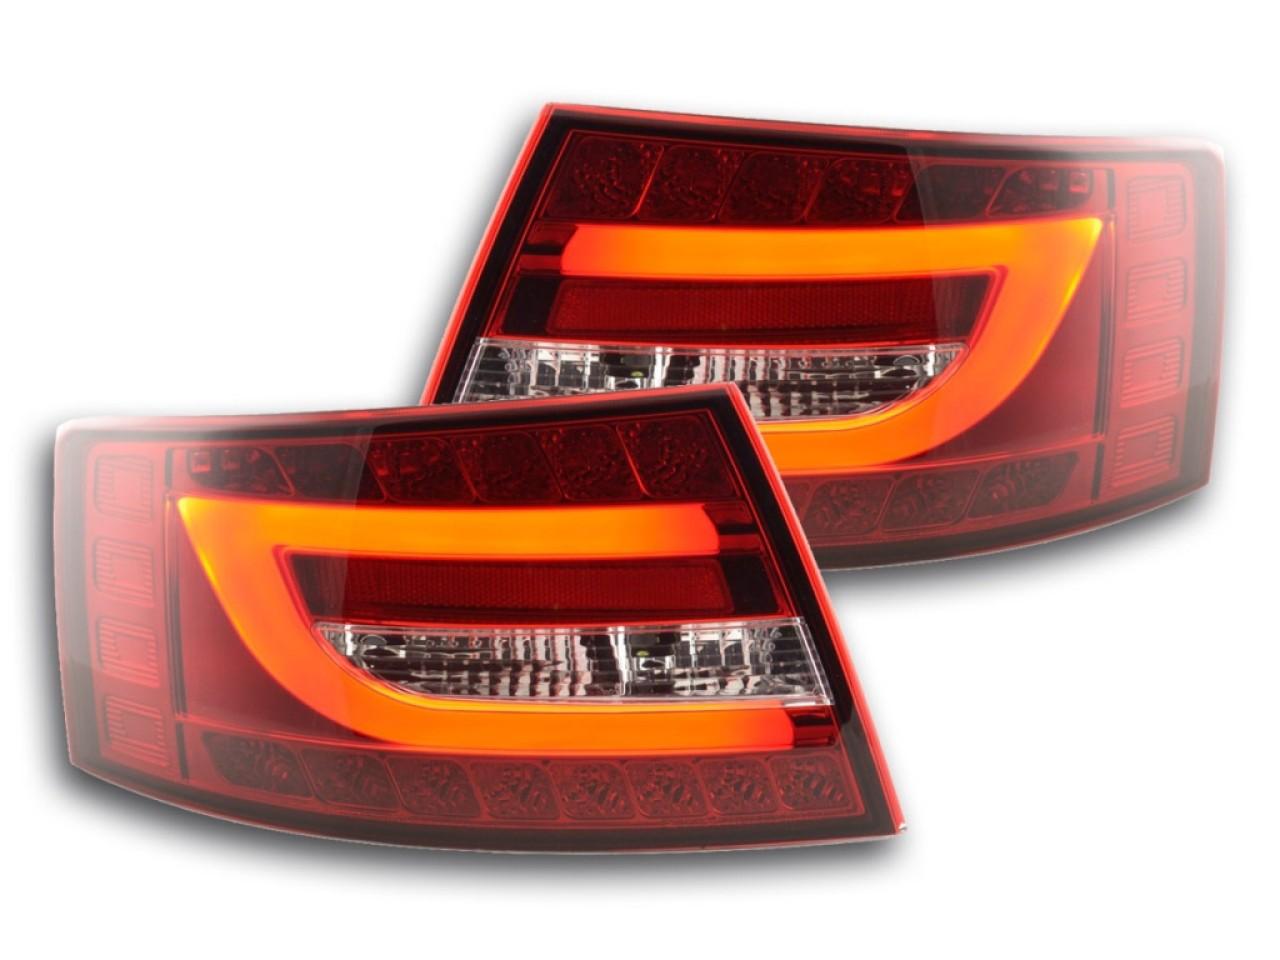 Stopuri led AUDI A6 4F - oferta!